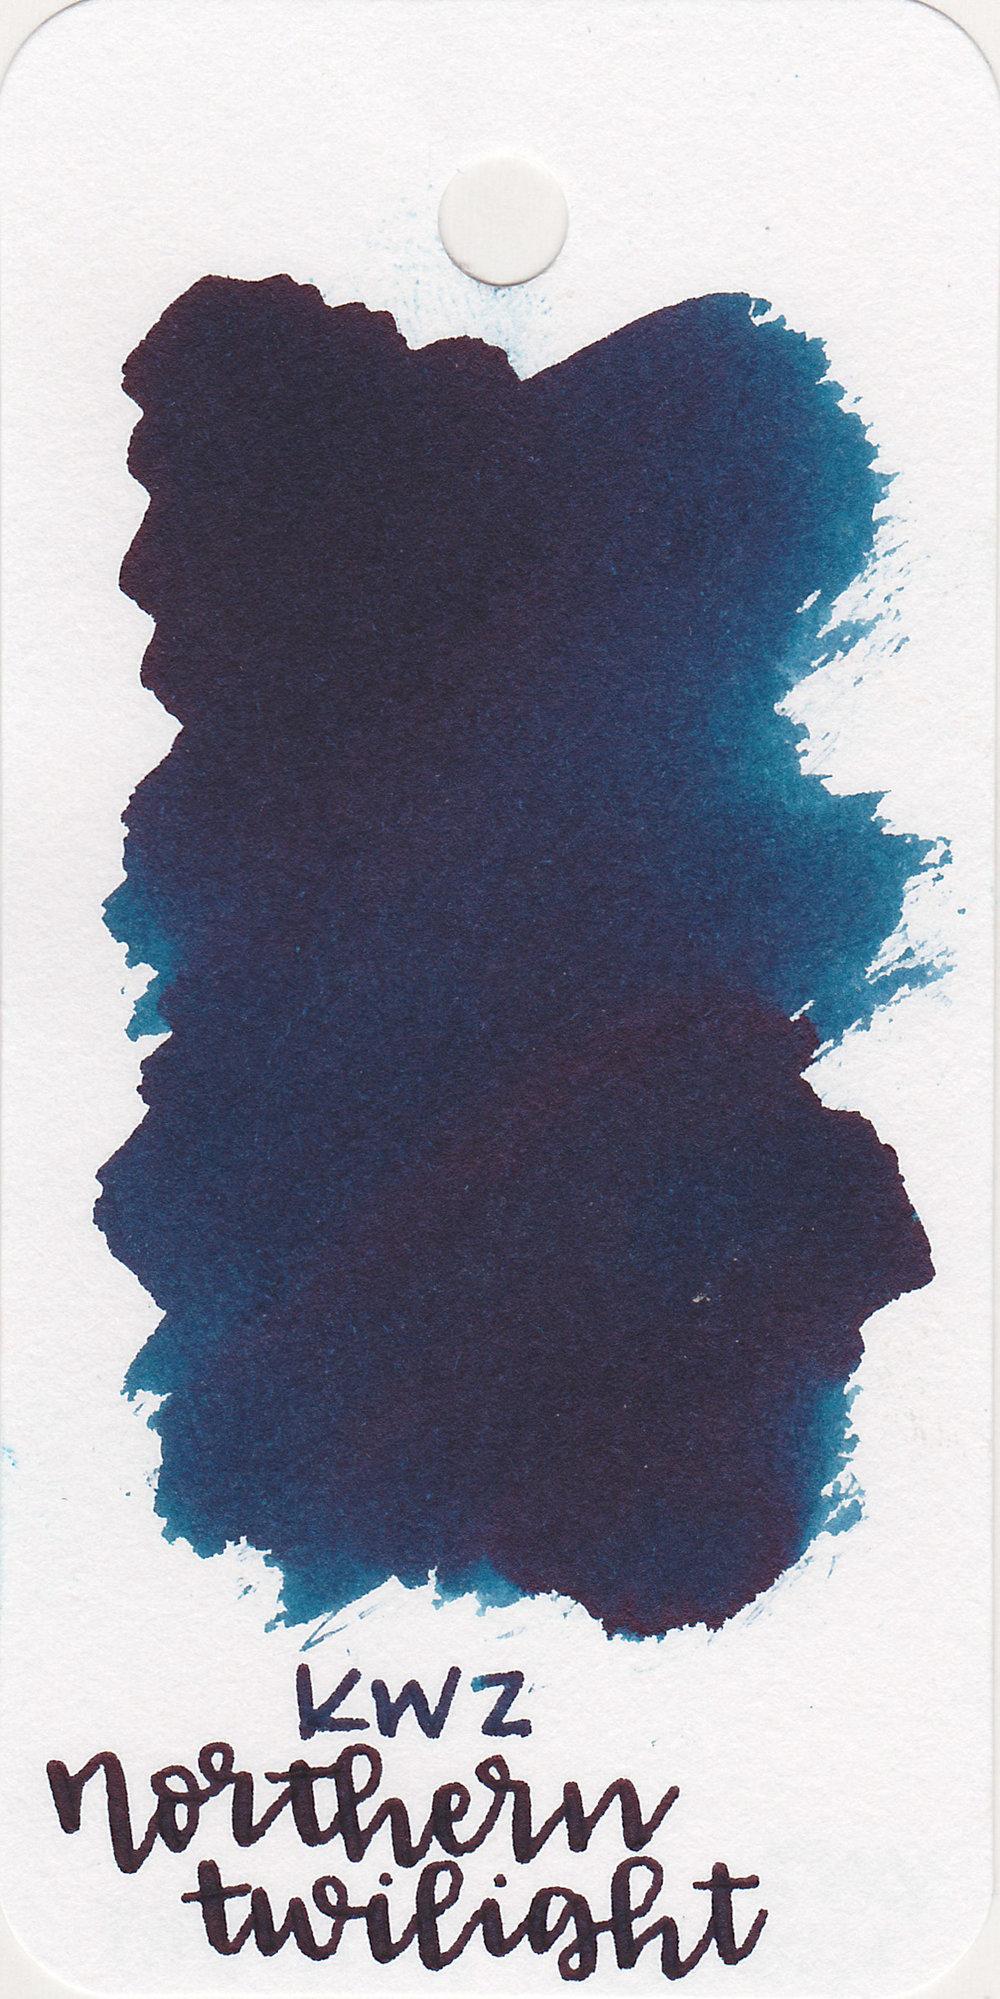 kwz-northern-twilight-1.jpg